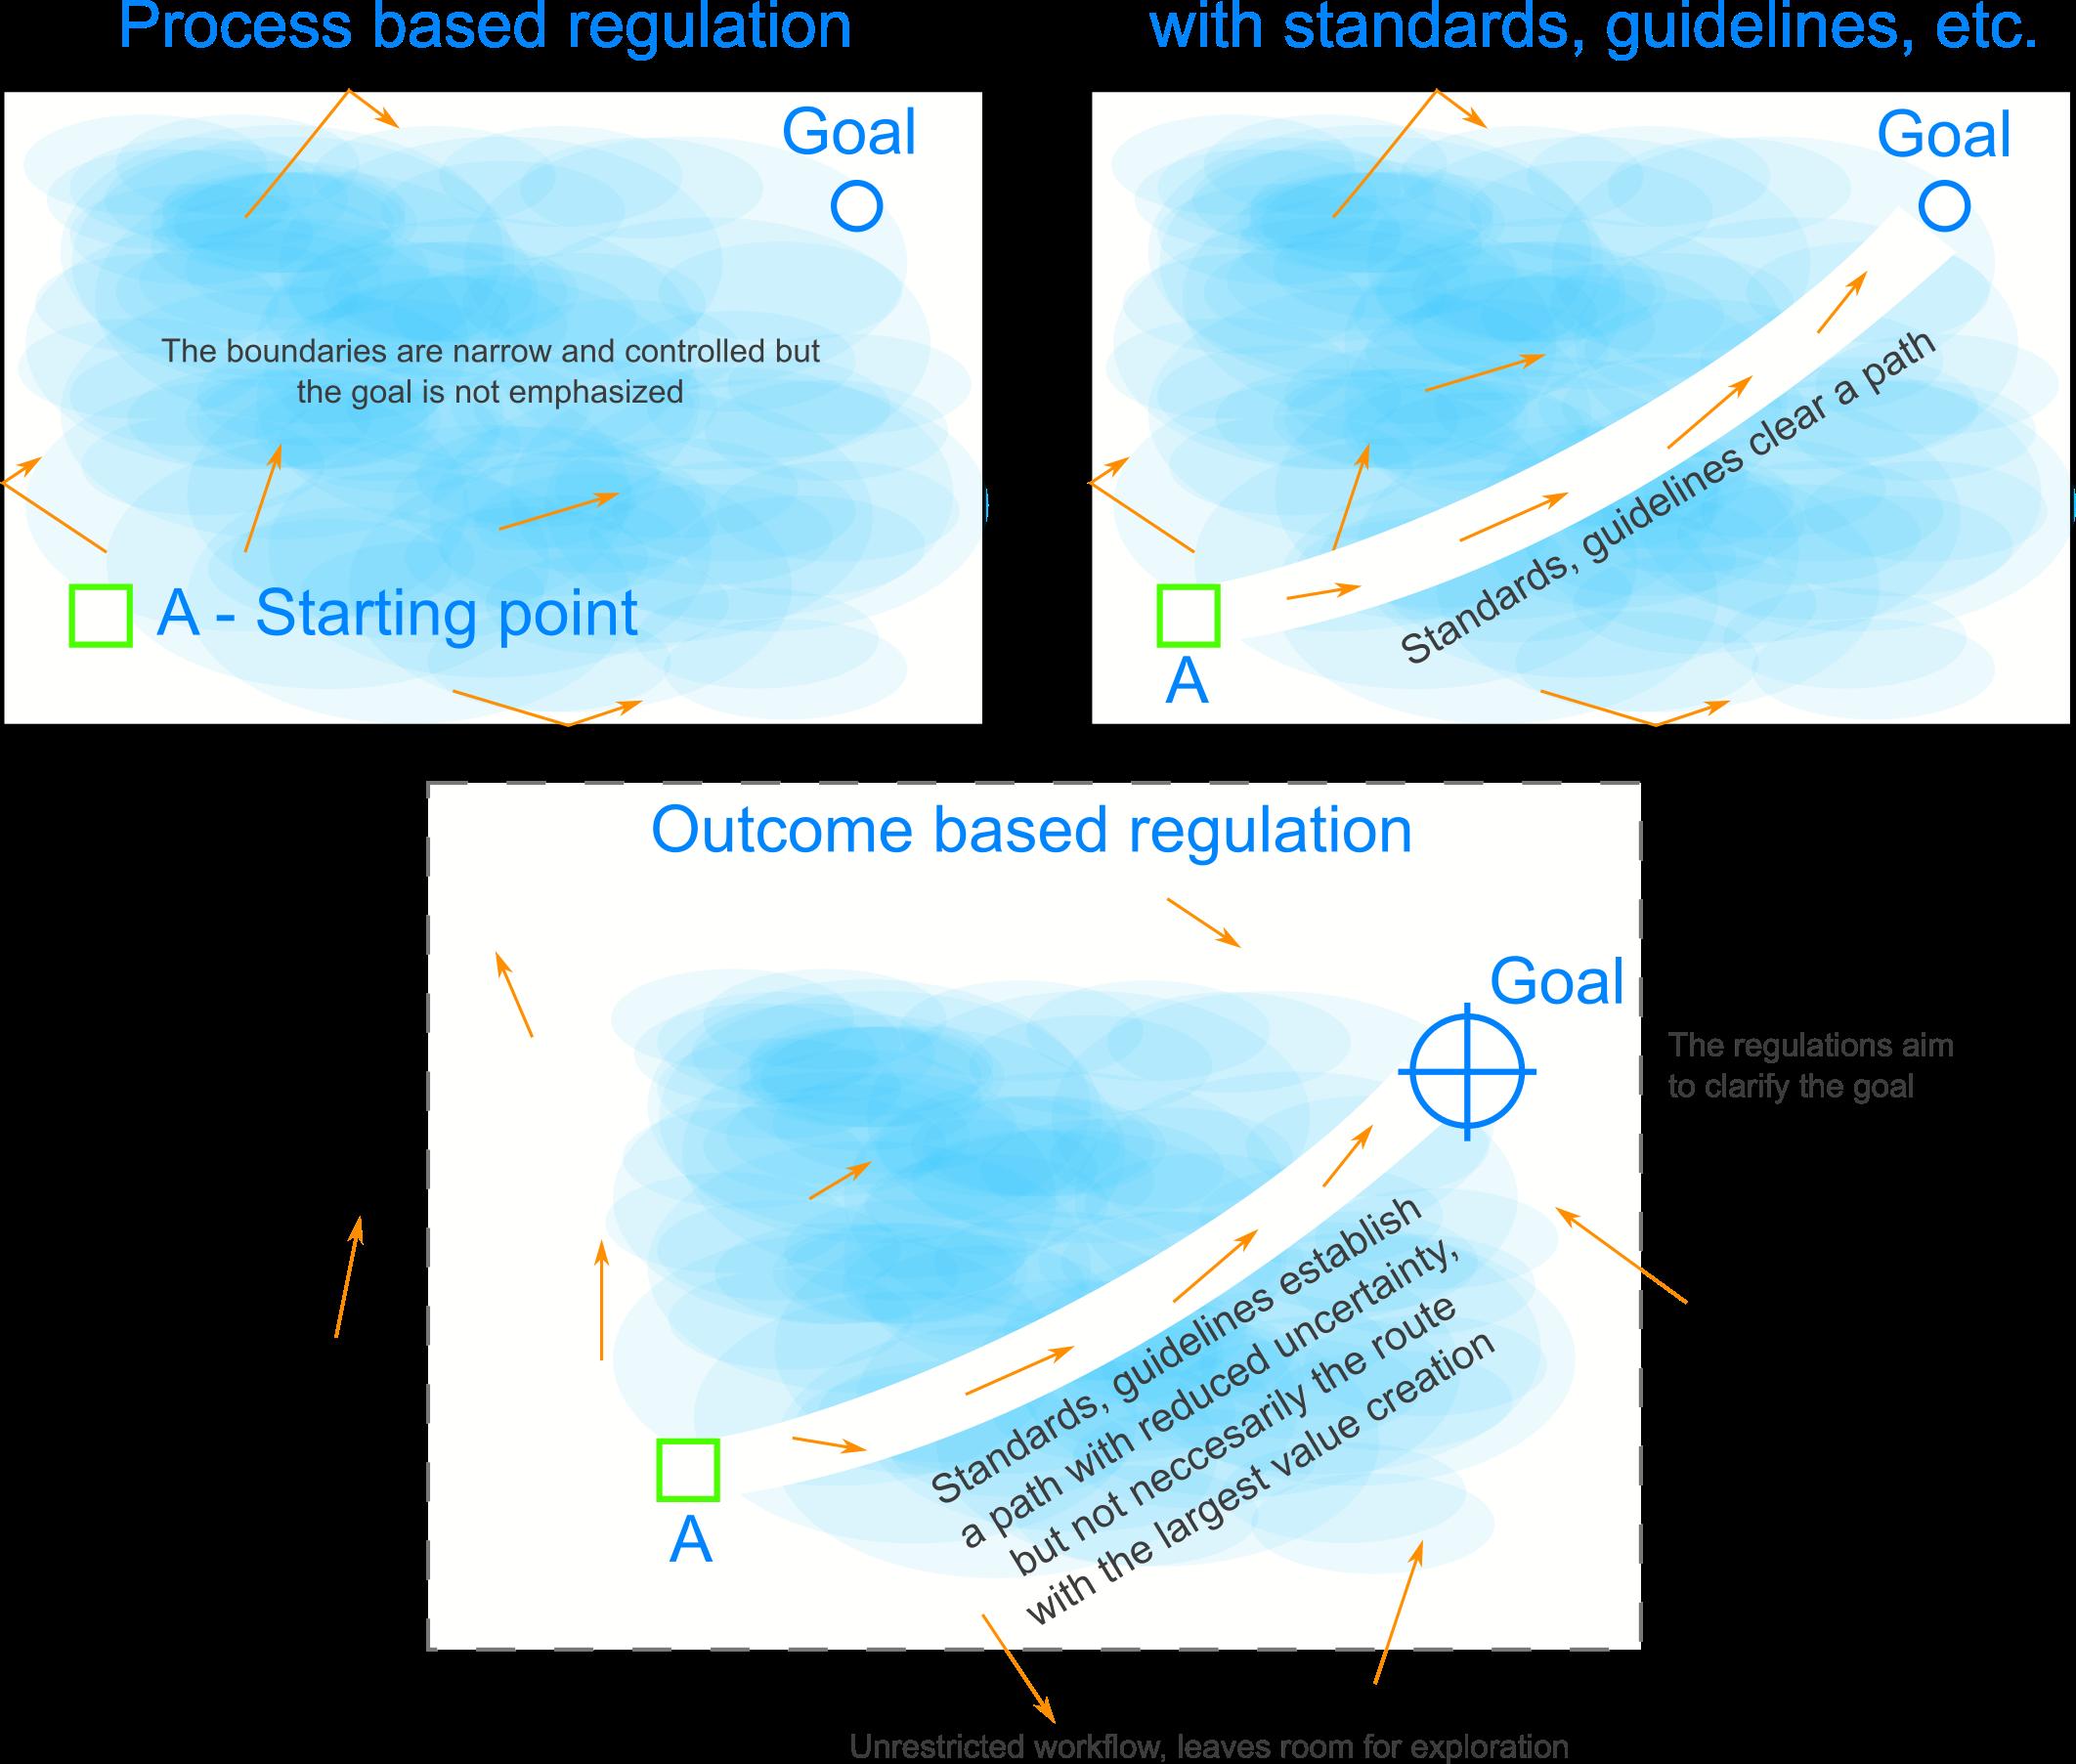 Outcome based regulation of AEC digitalization